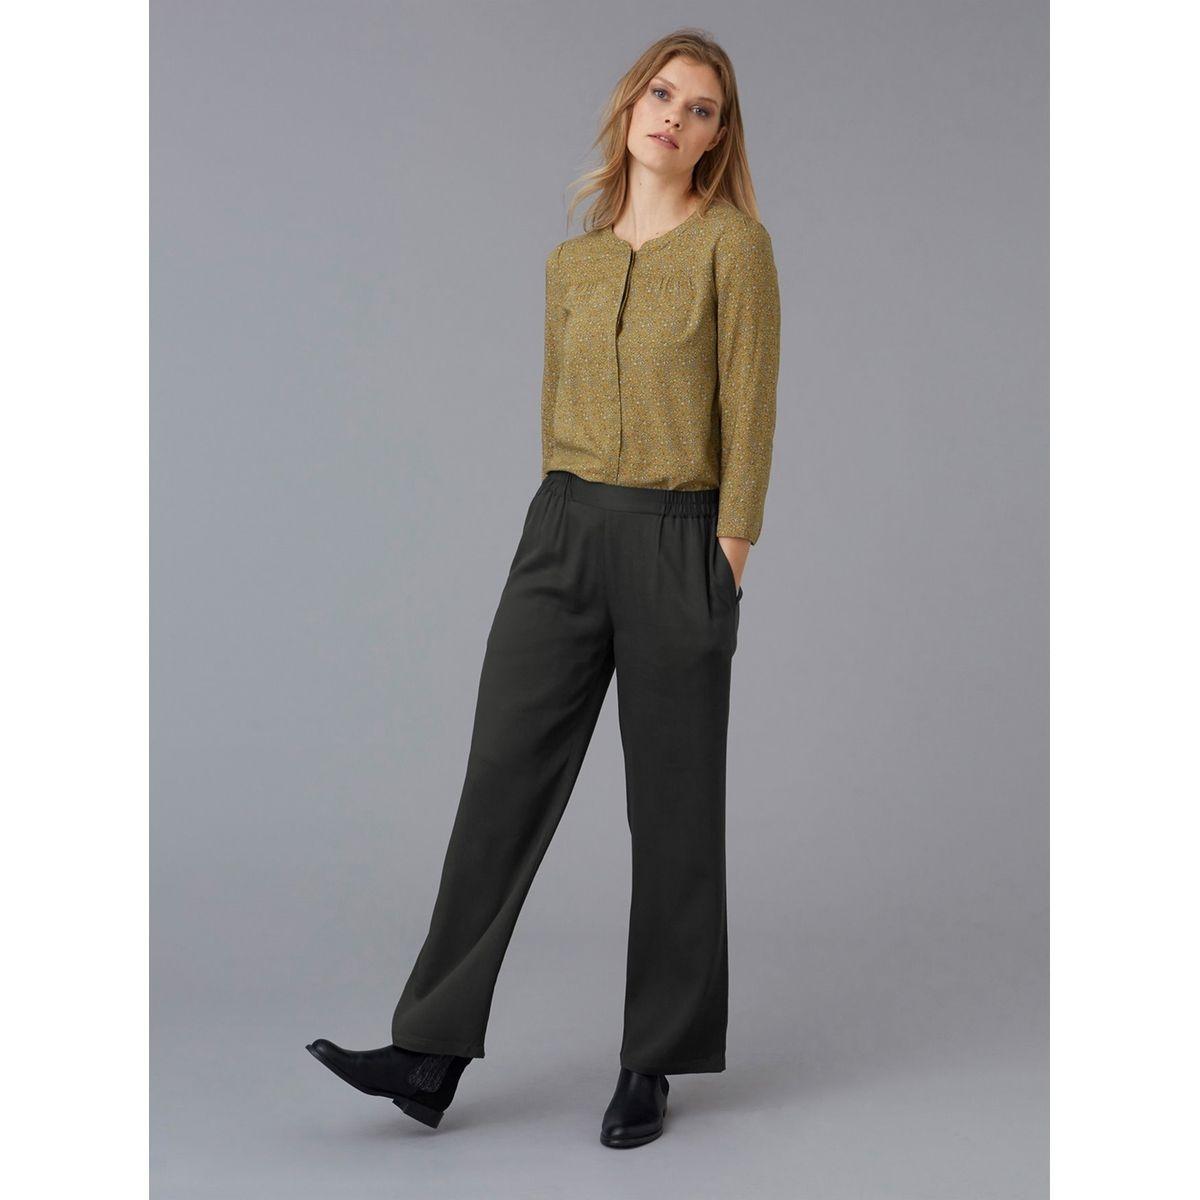 Pantalon femme twill viscose droit 7/8ème, MAZAN